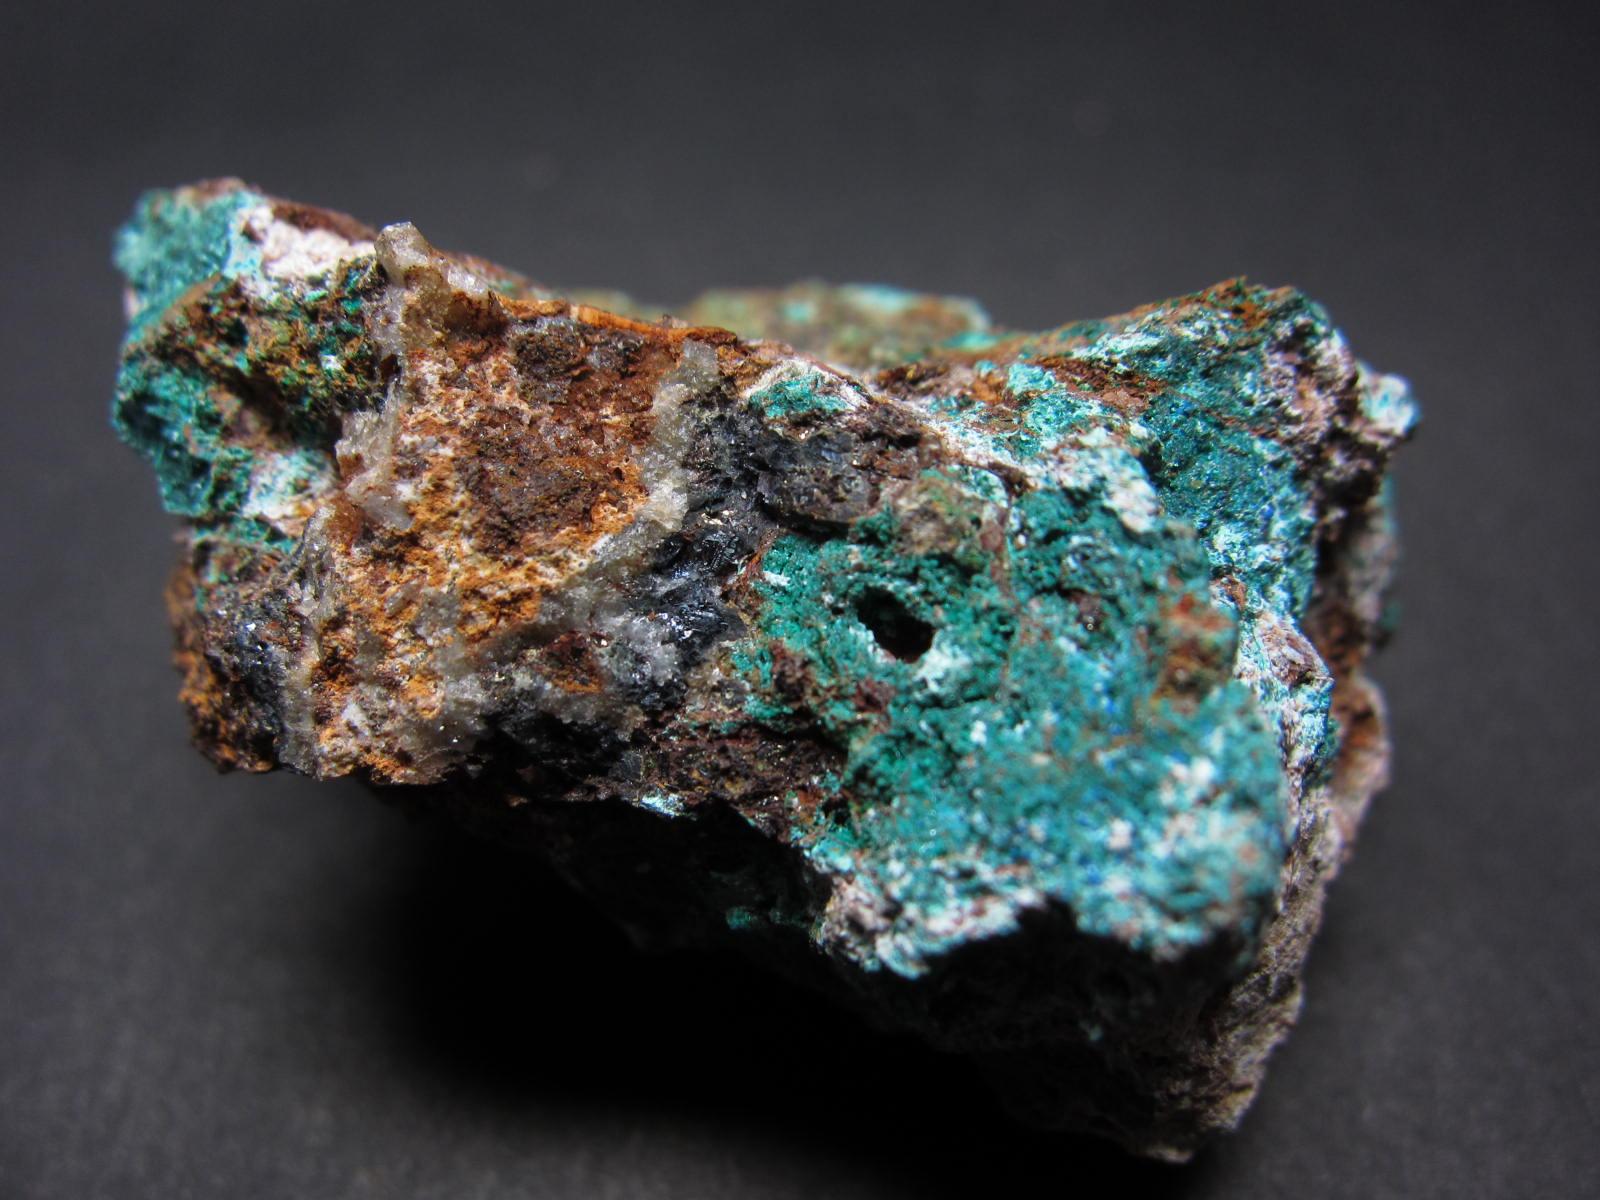 Brochantiteブロシャン銅鉱